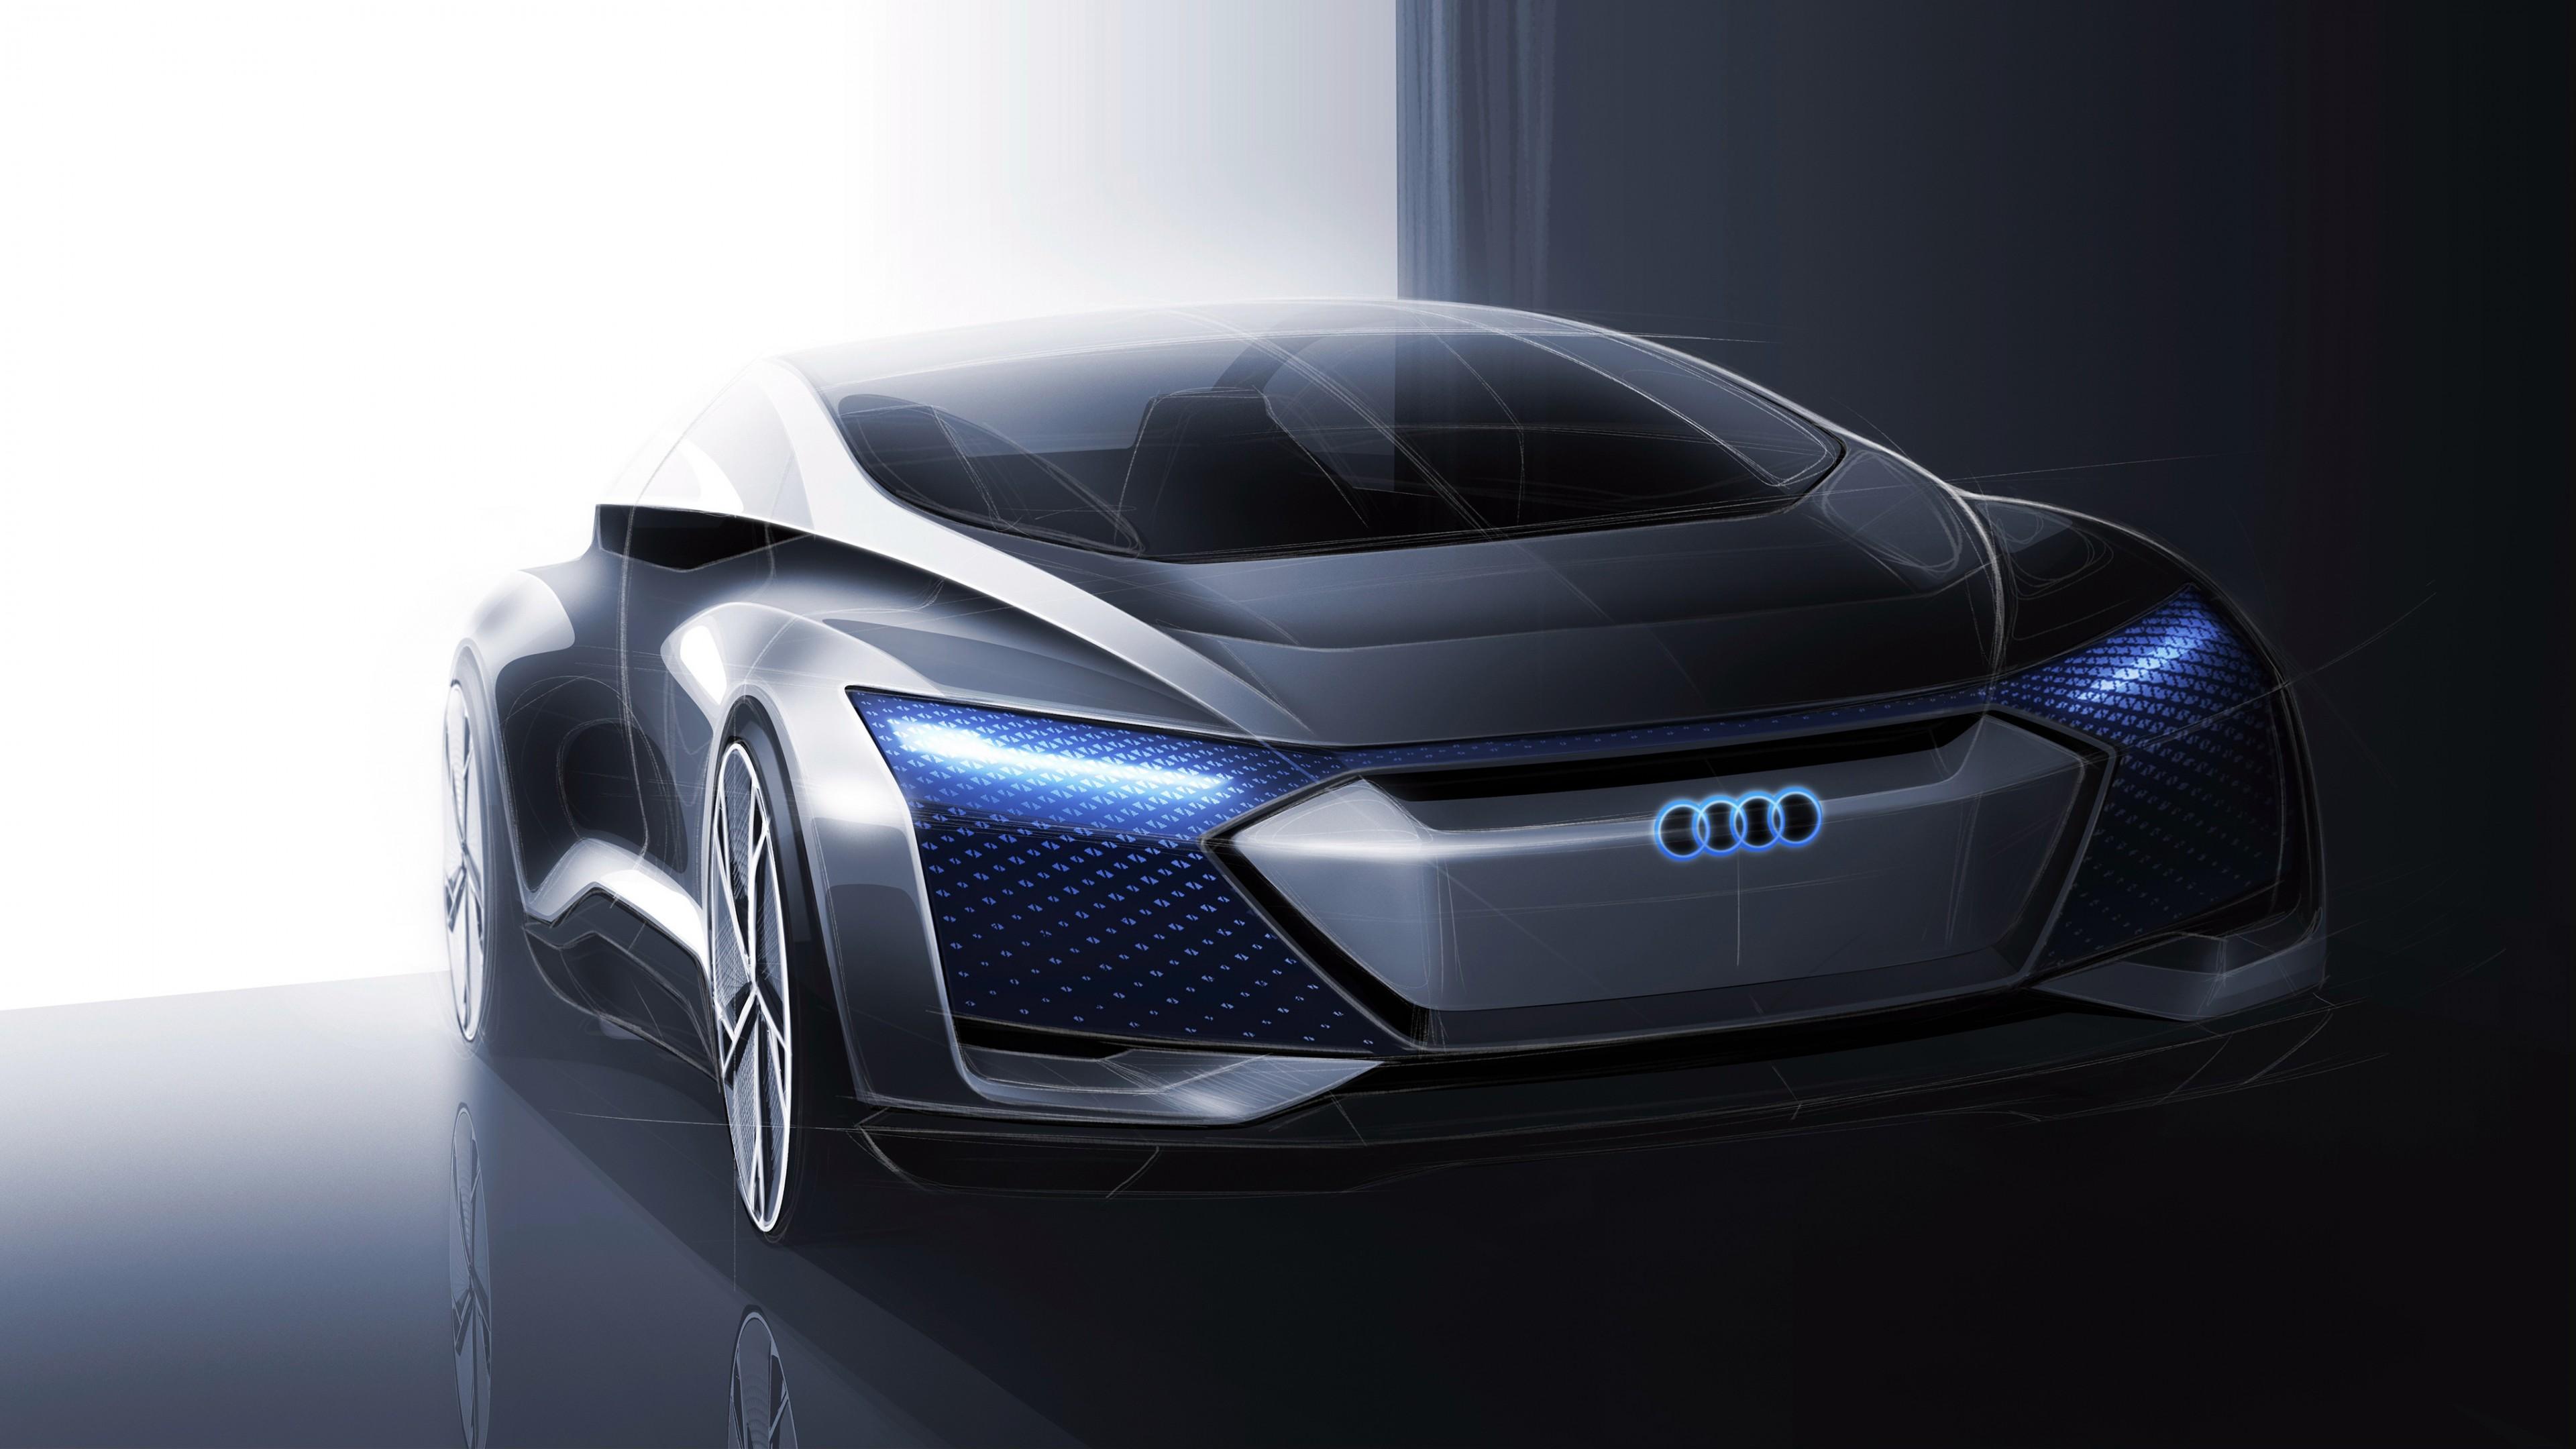 Audi Aicon Concept Car 4K Wallpaper   HD Car Wallpapers ...